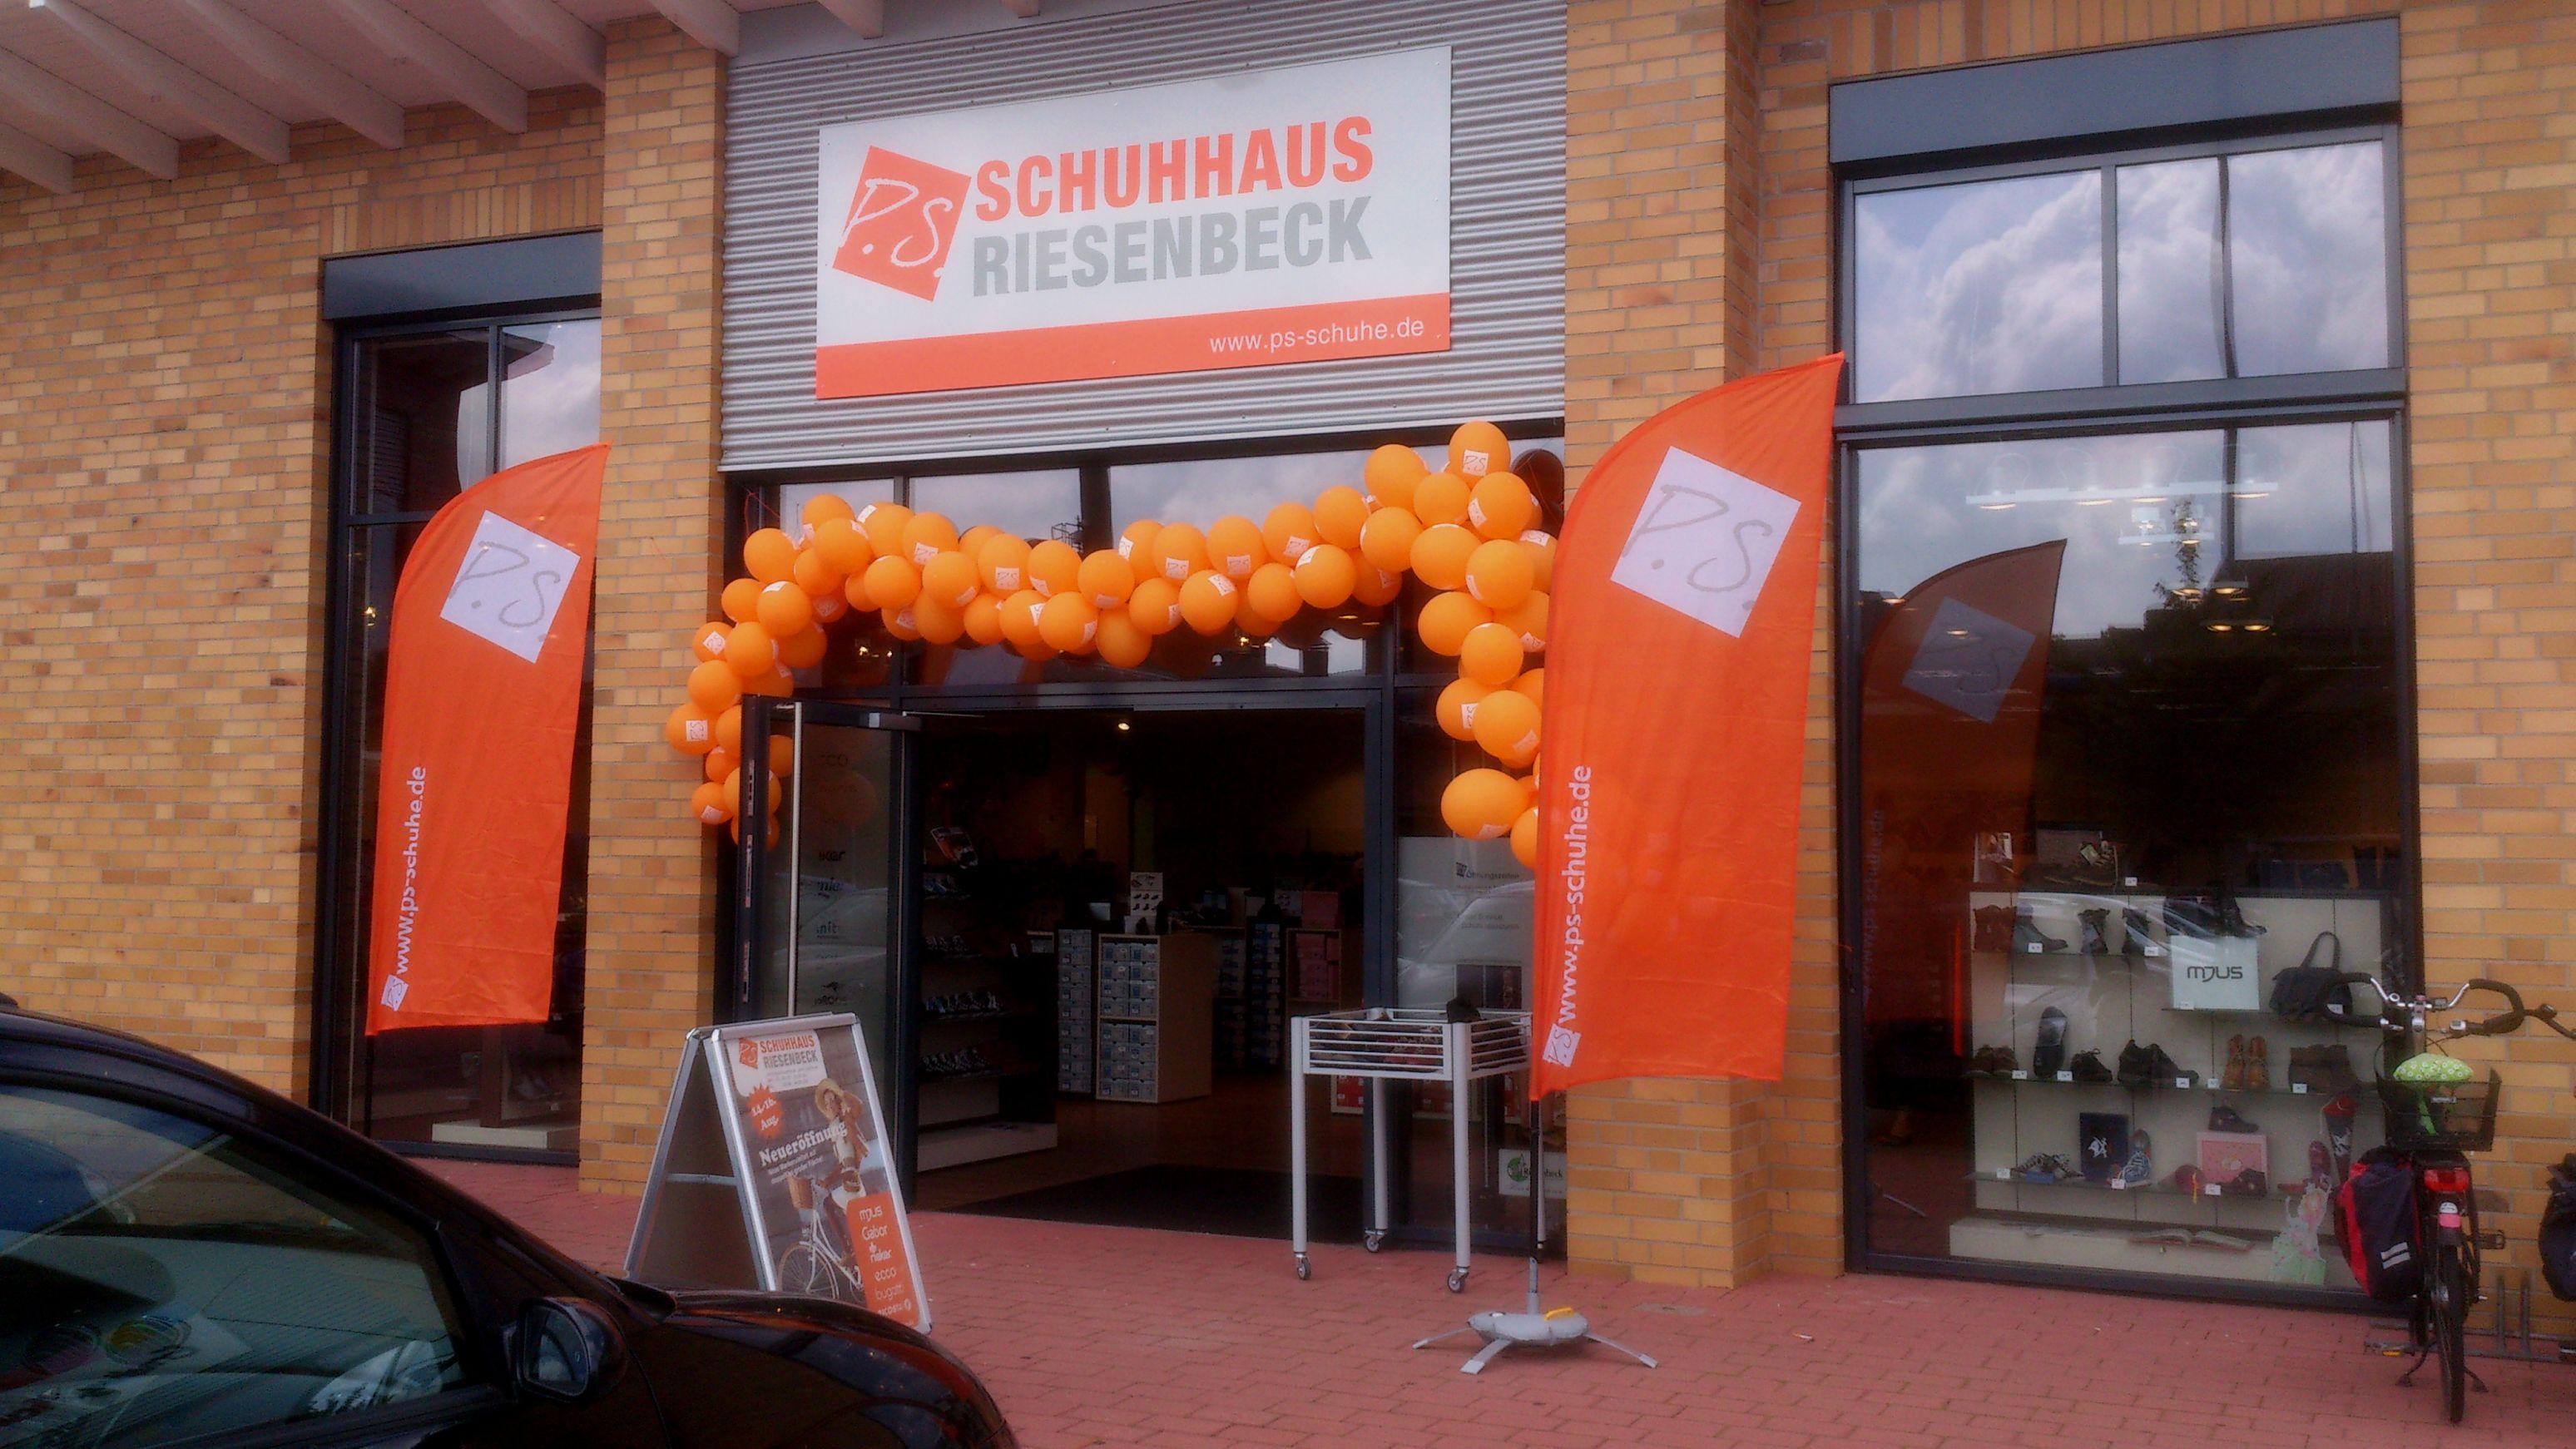 P.S. Schuhhaus Riesenbeck